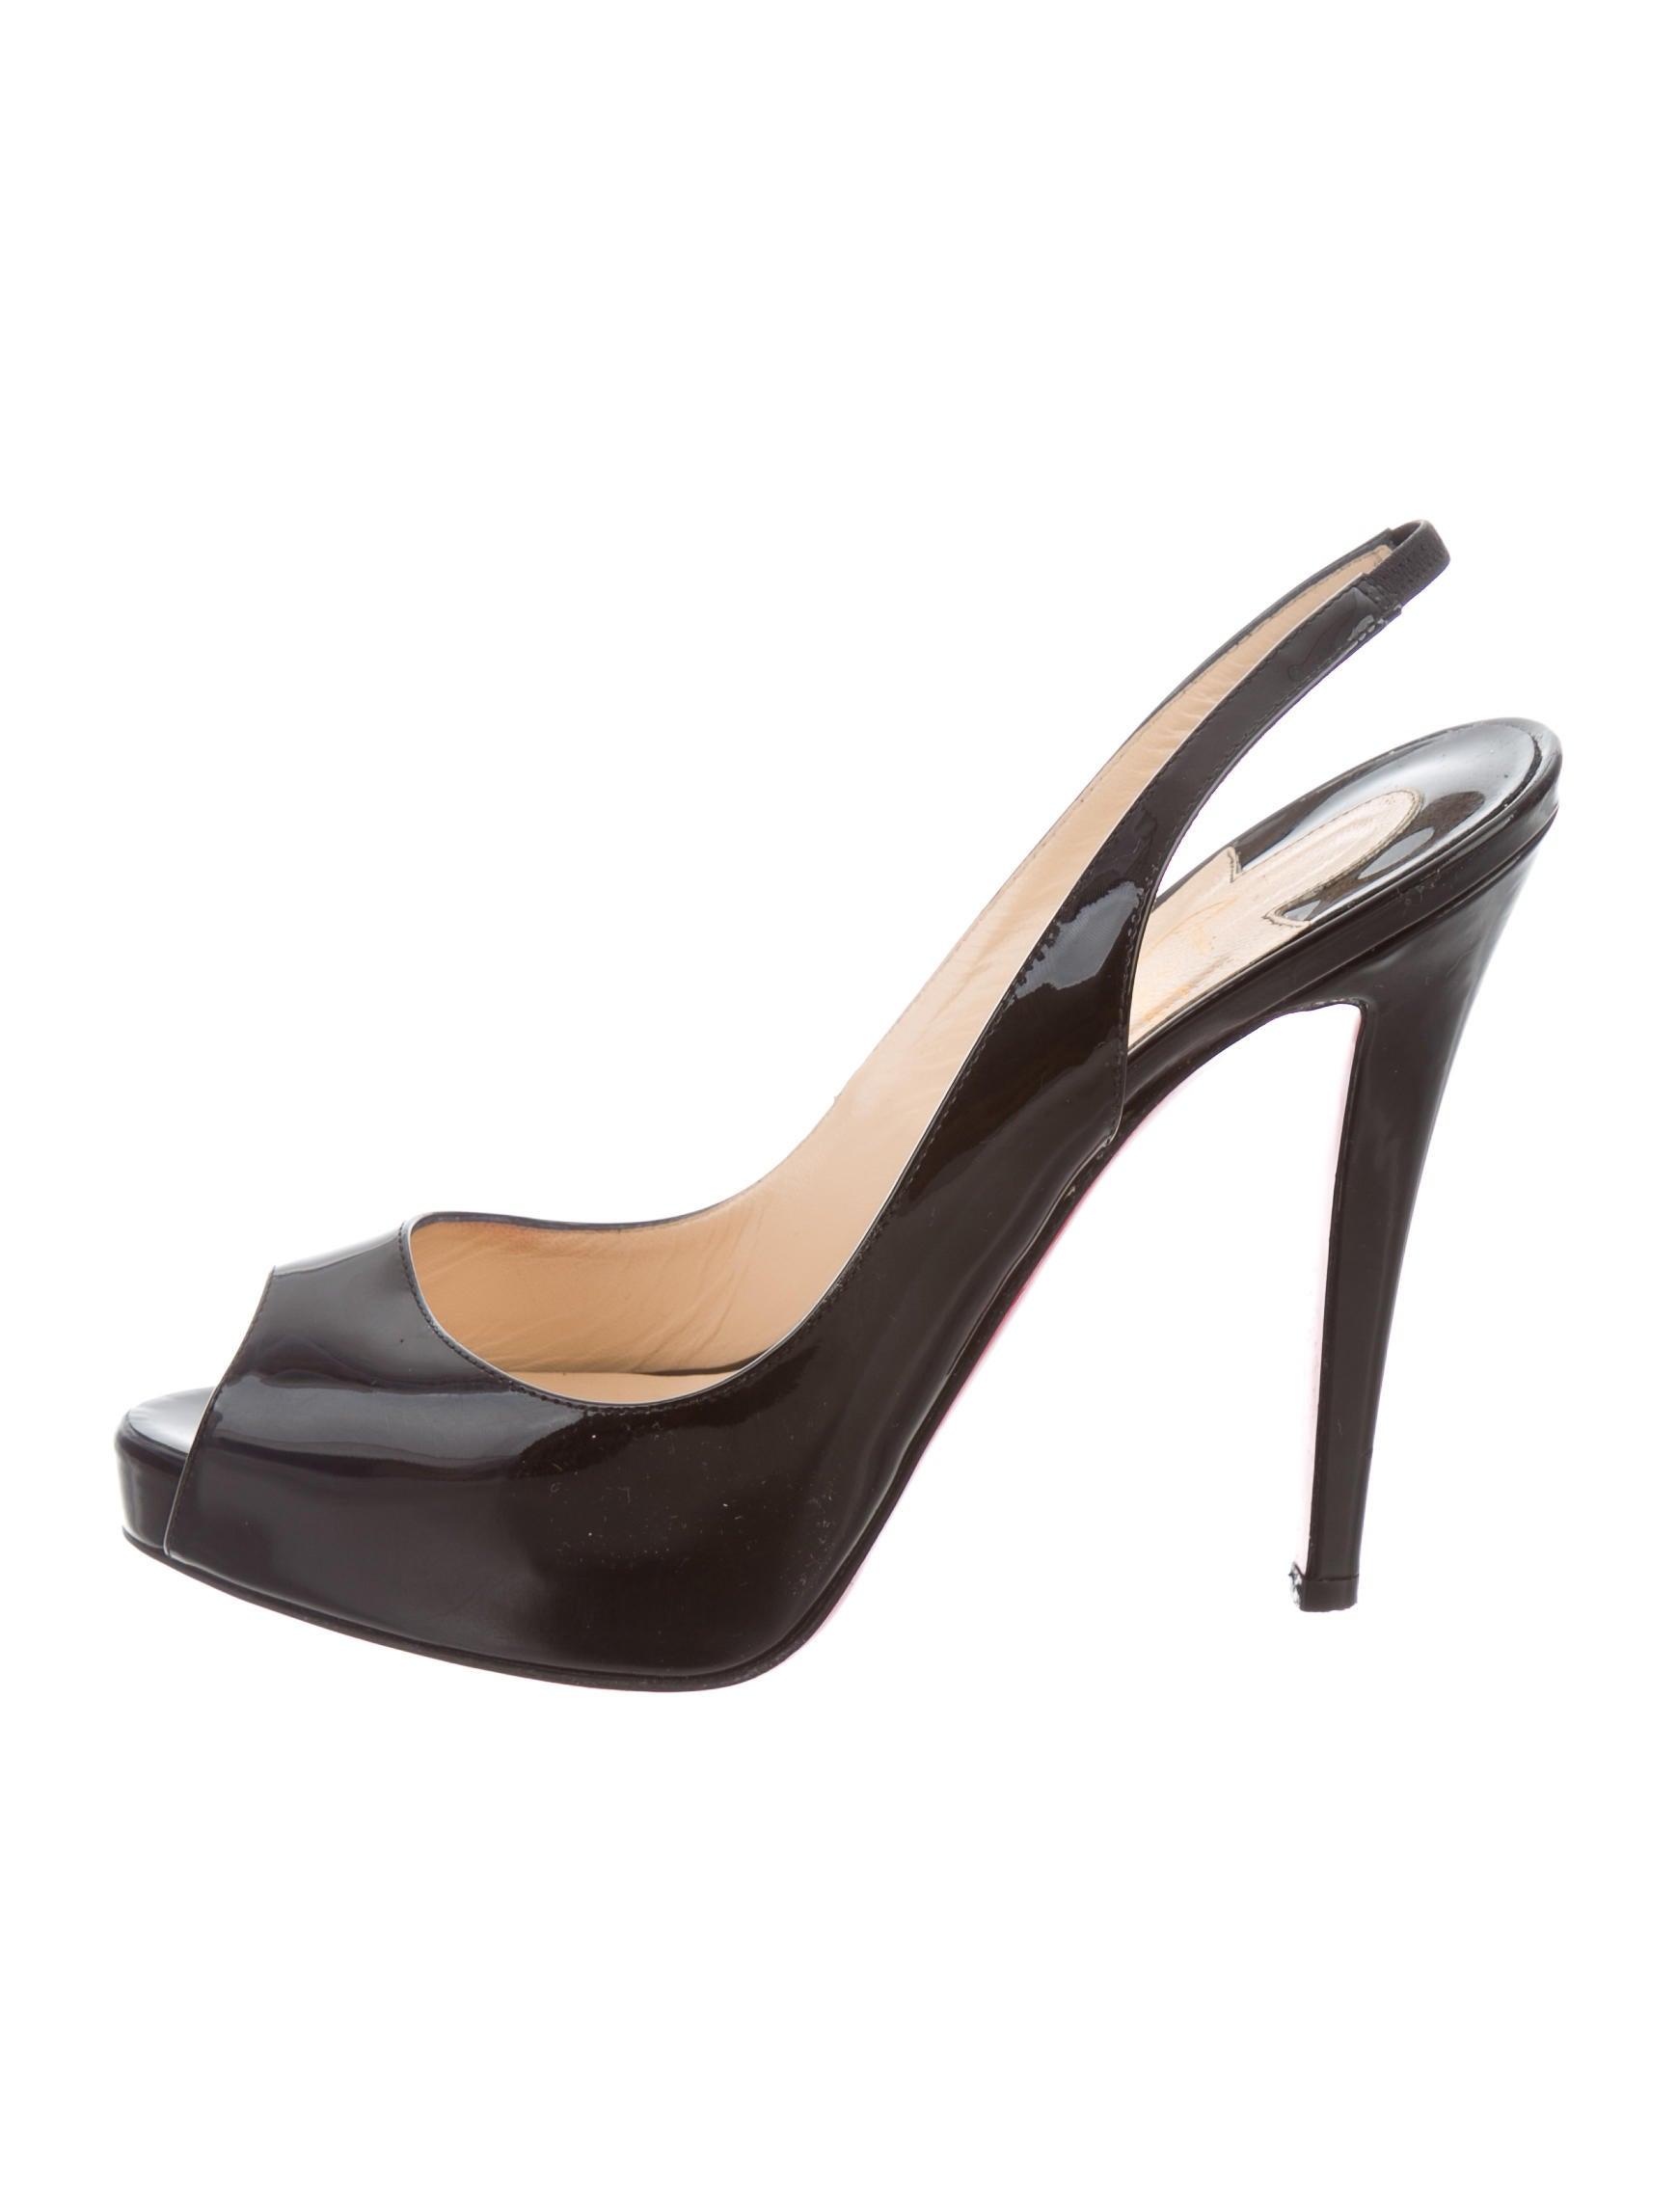 Christian Louboutin Peep-Toe Slingback Pumps - Shoes - CHT72294 | The RealReal